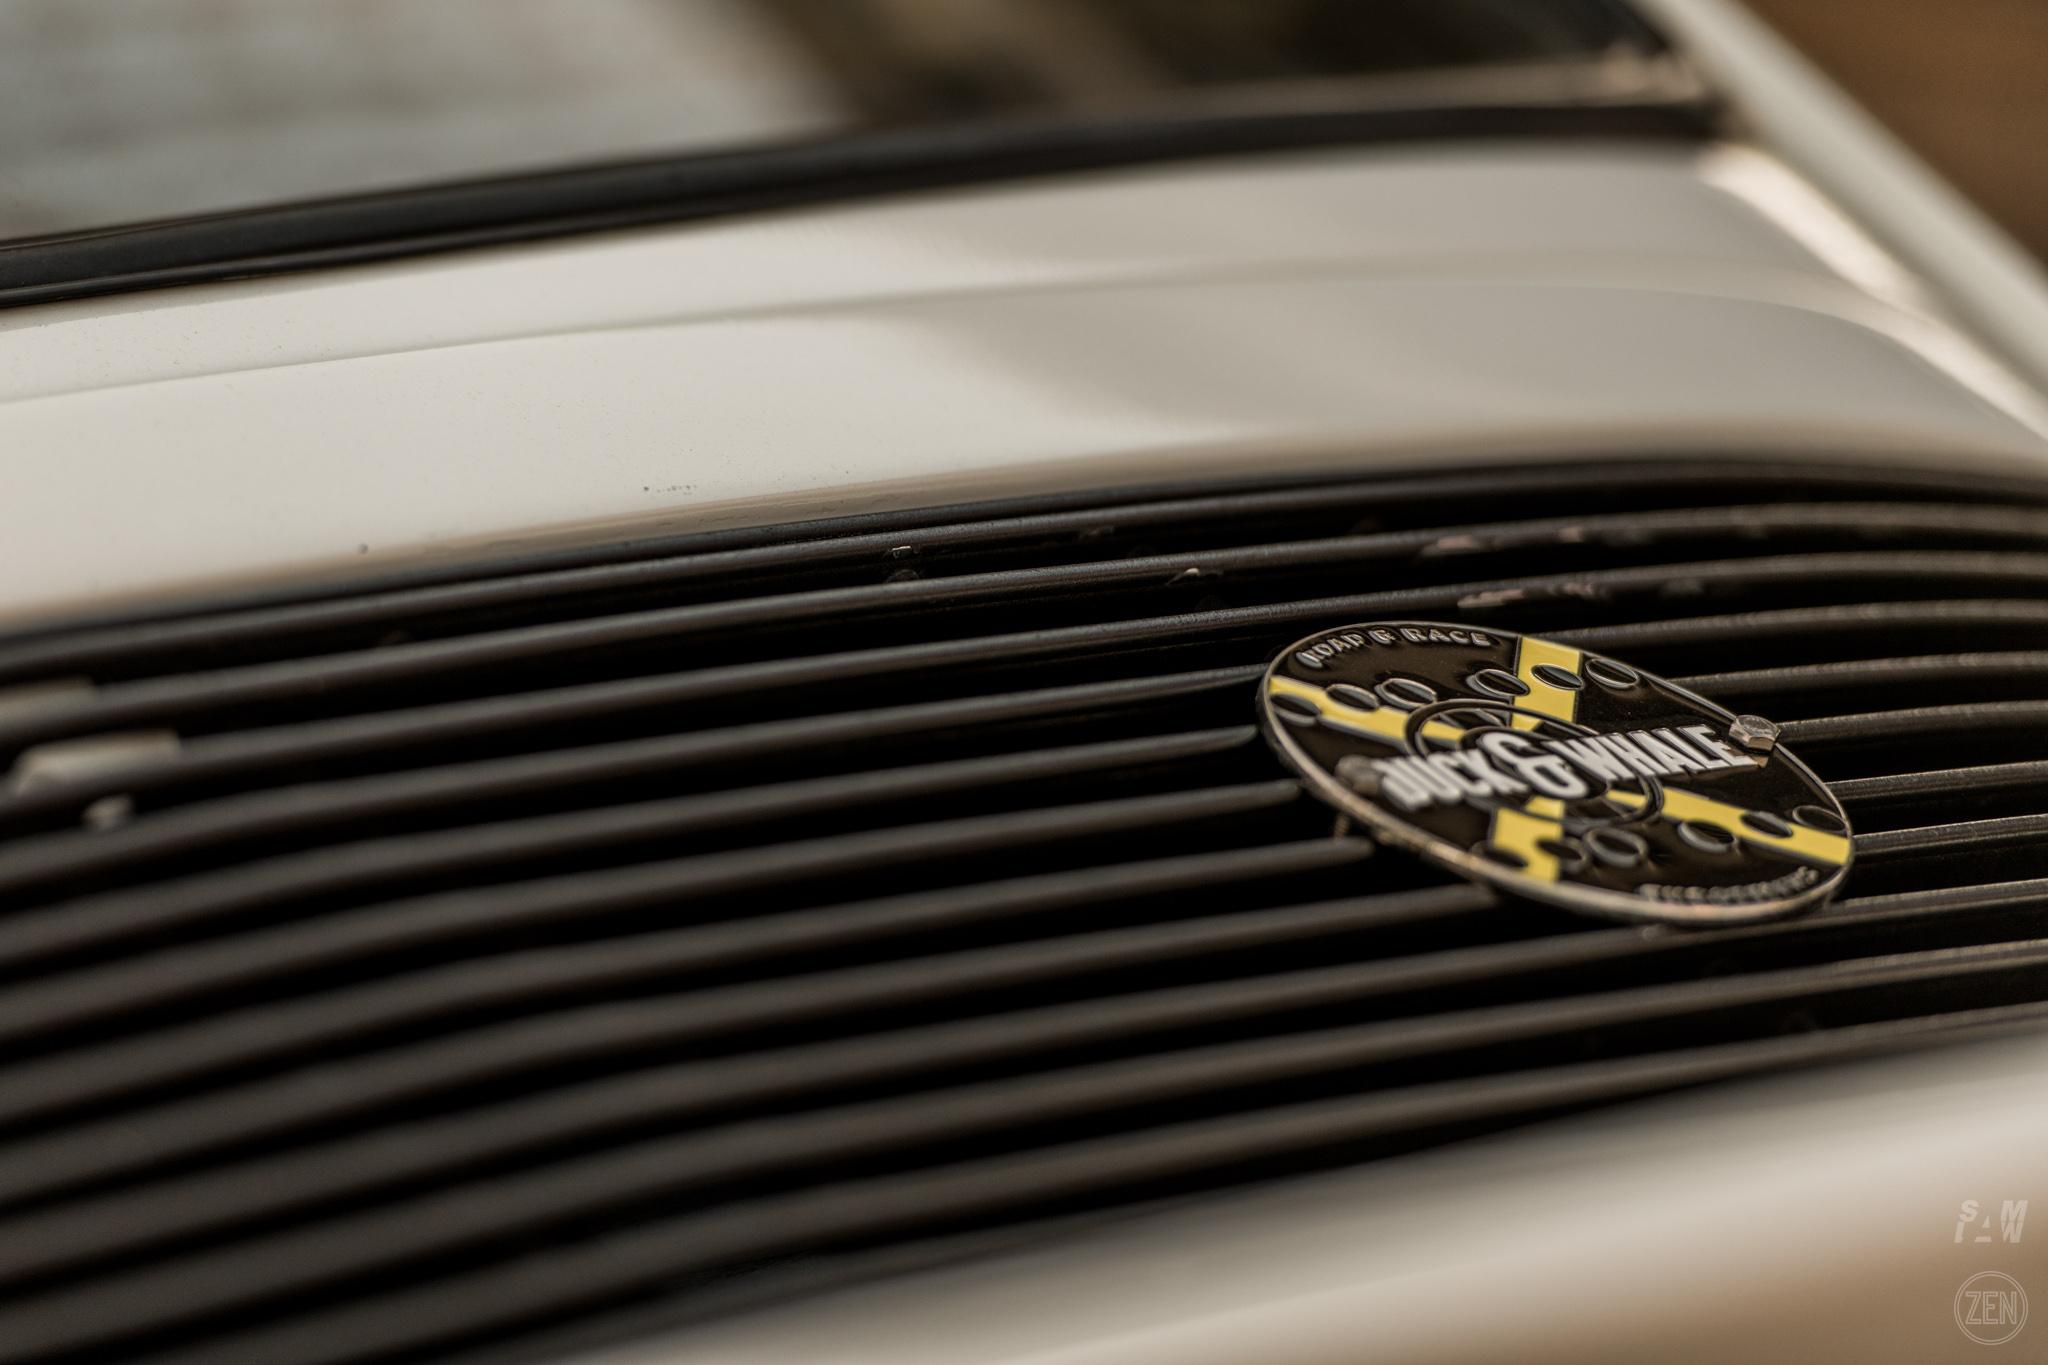 2019-10-27 - Autohaus Porsches & Coffee 063